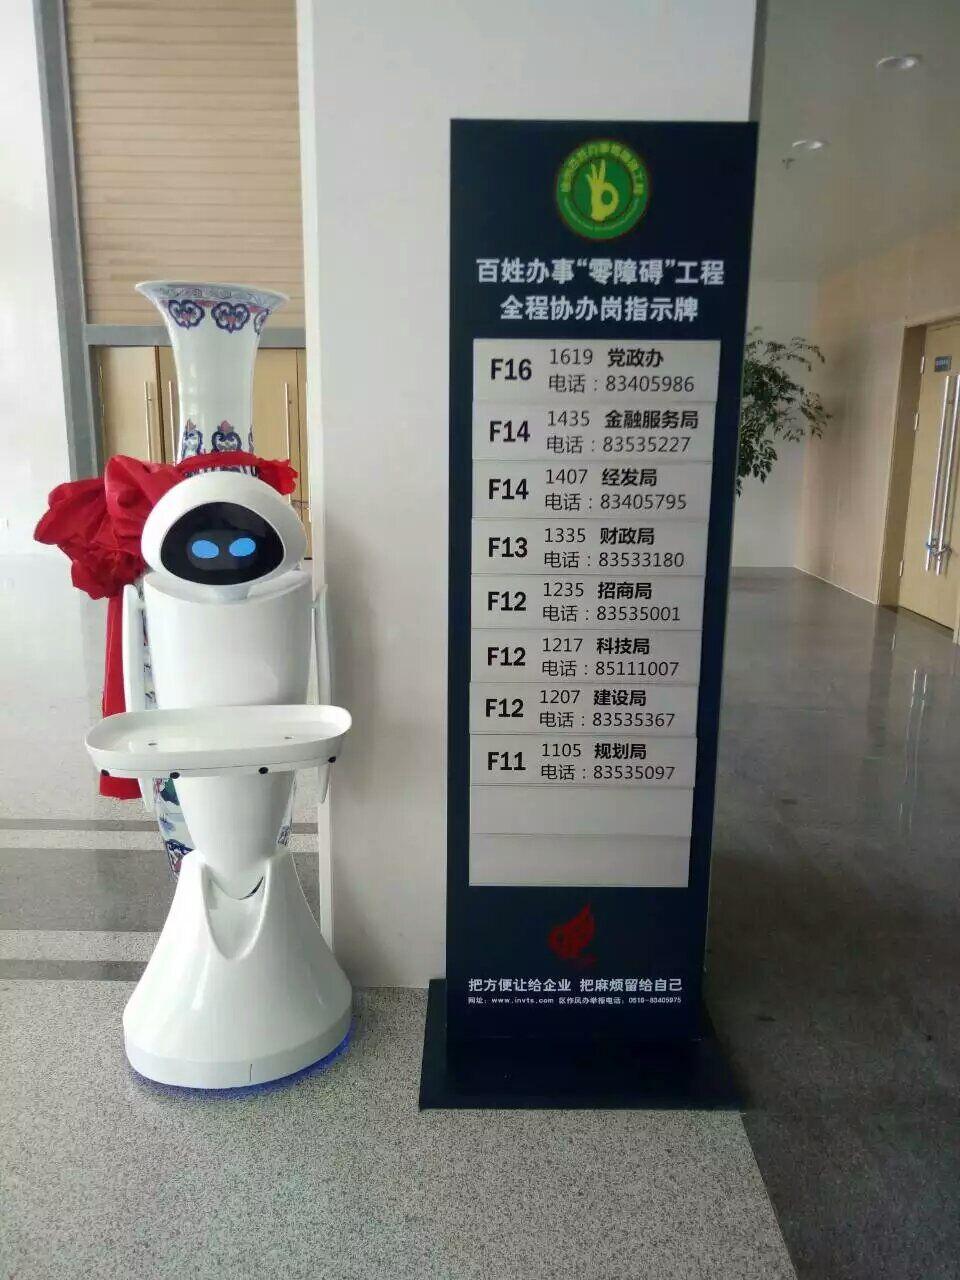 Eva政府导览机器人